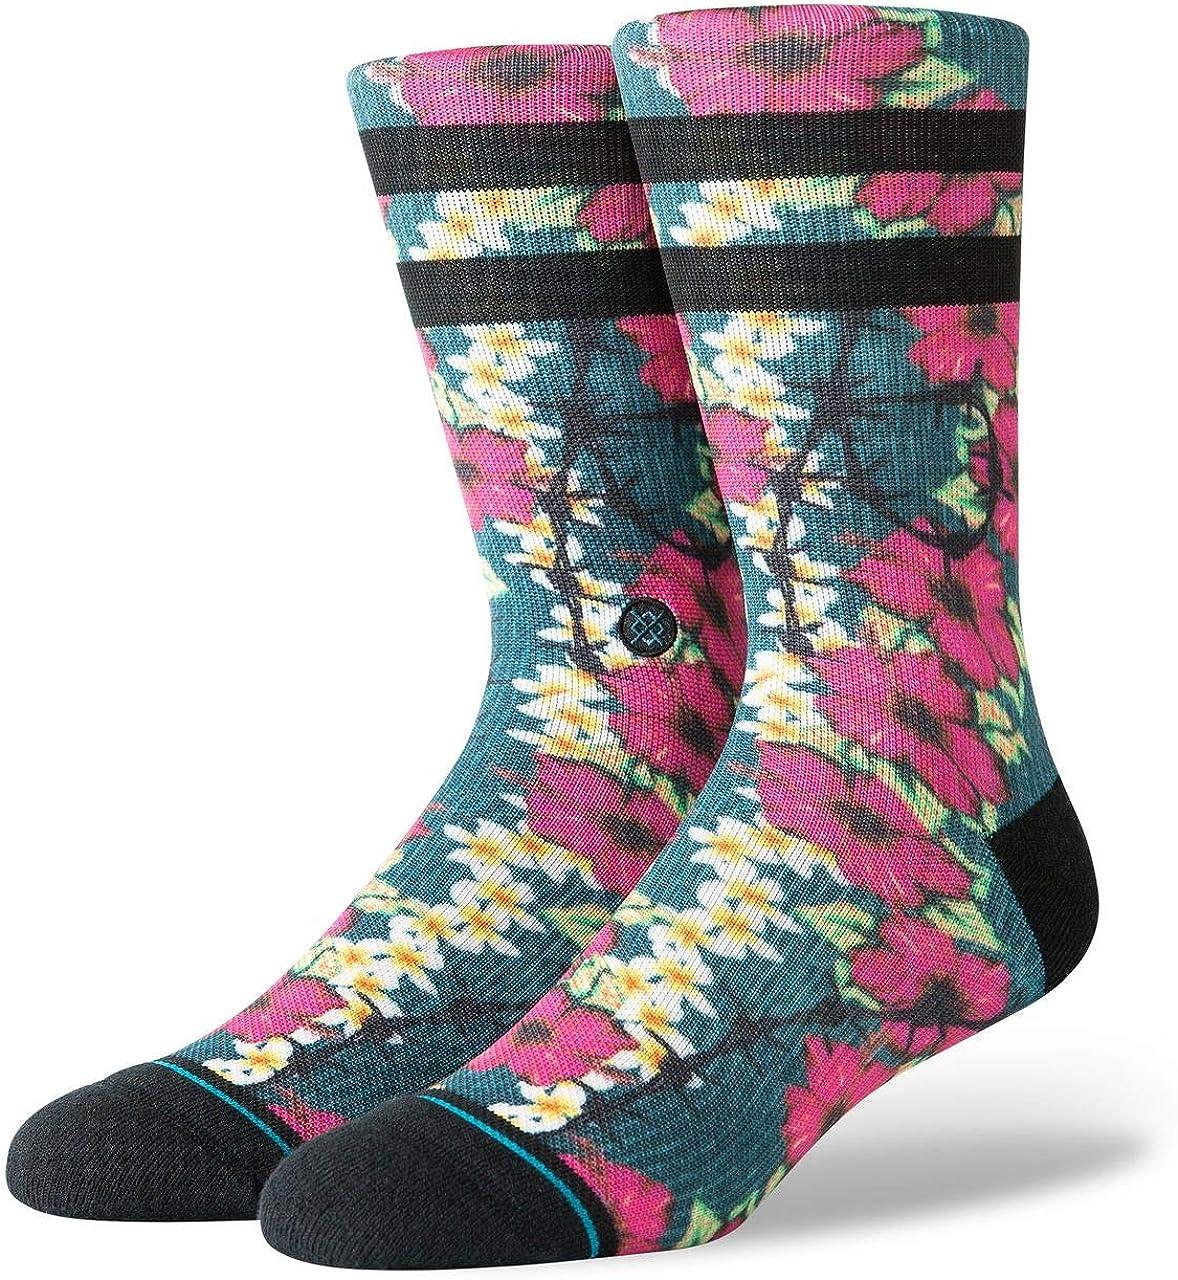 STANCE Men's Barrier Reef Socks